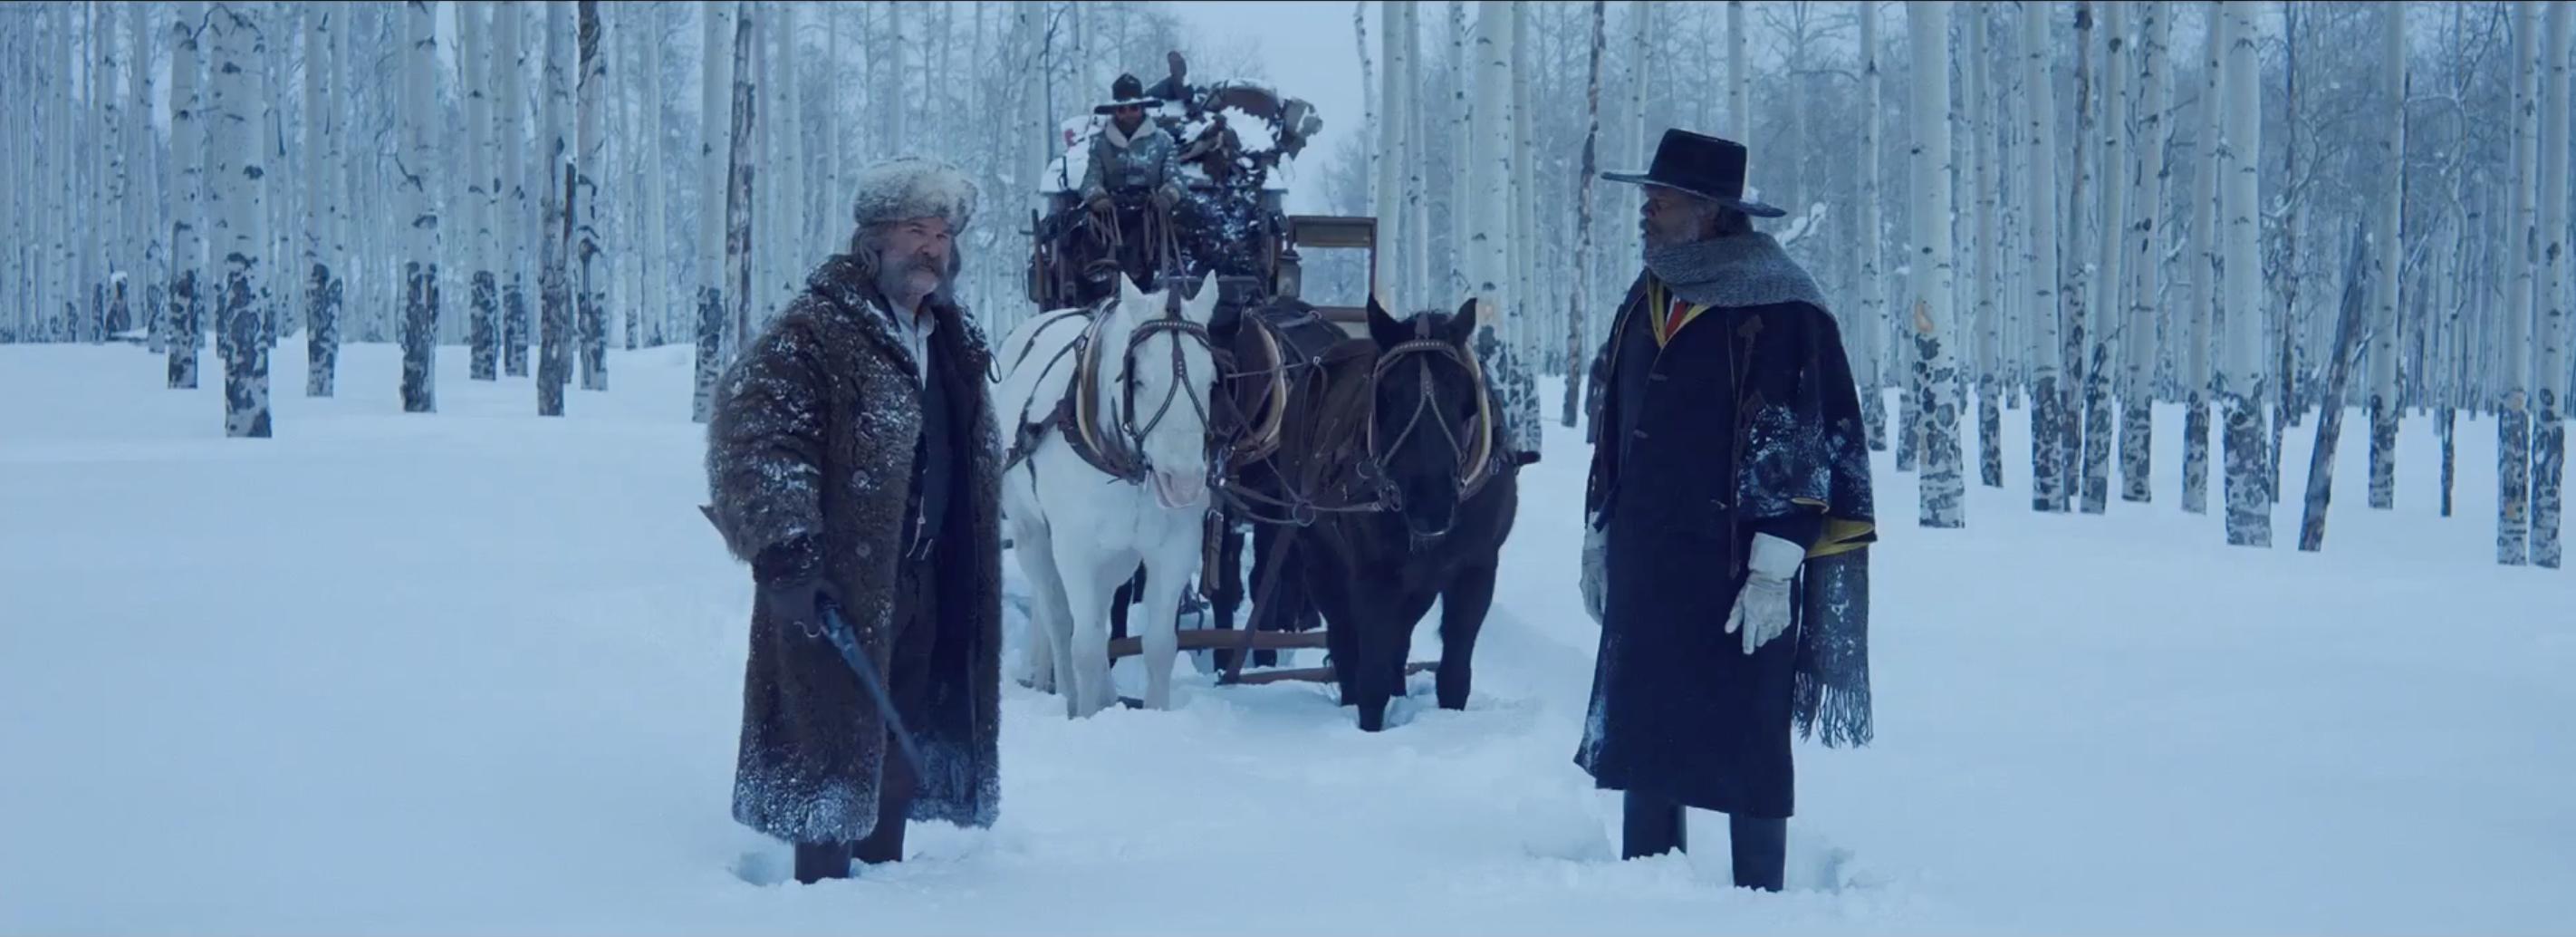 The Hateful Eight: Kurt Russell e Samuel L. Jackson nel teaser trailer del film di Tarantino